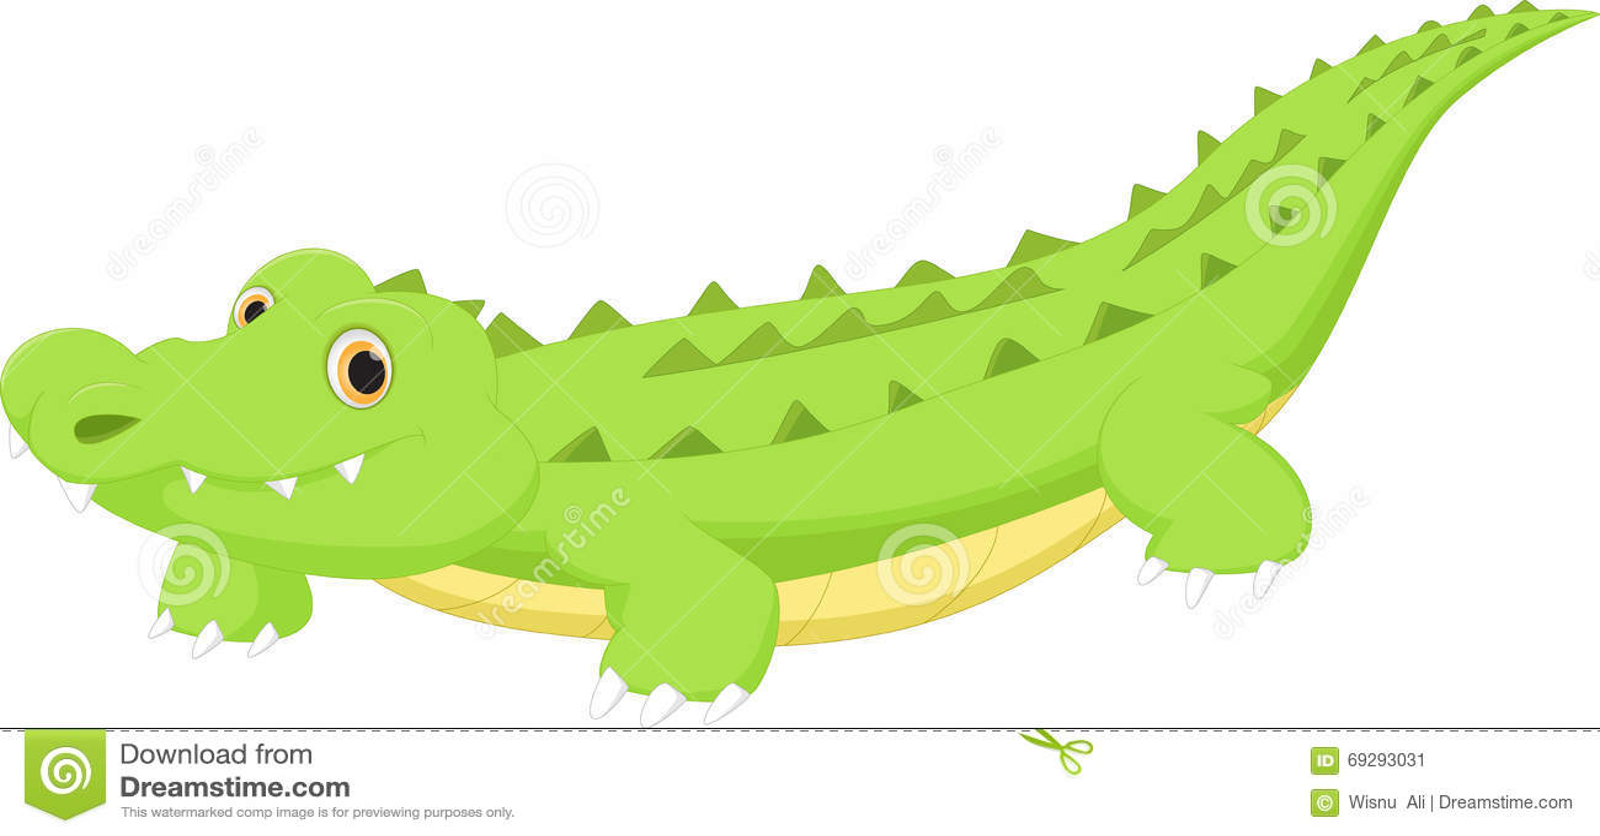 Cute crocodile cartoon stock vector. Illustration of ...